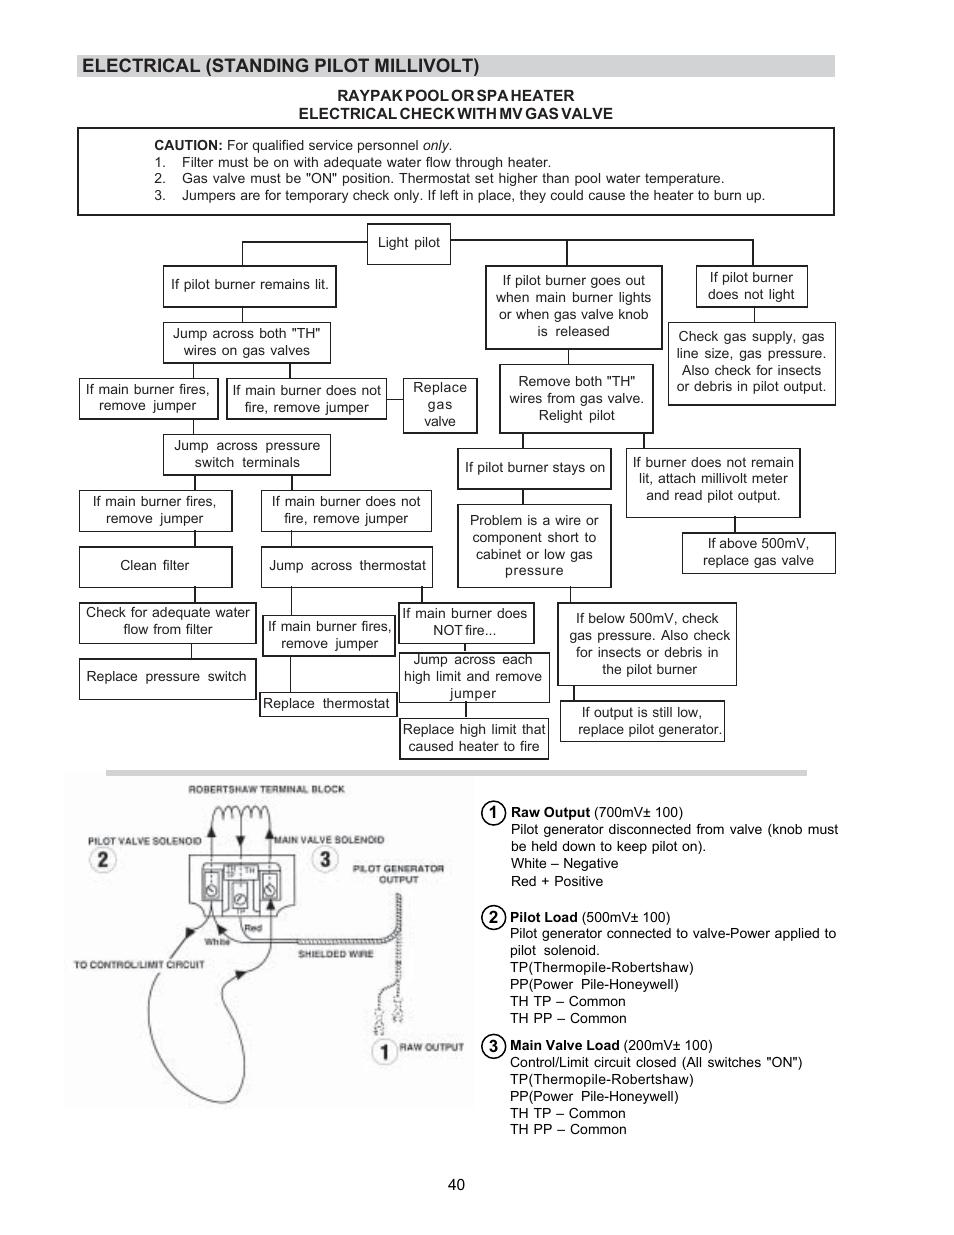 Electrical Standing Pilot Millivolt Raypak P R185bl To R405bl Clean Burn Burner Wiring Diagram User Manual Page 40 52